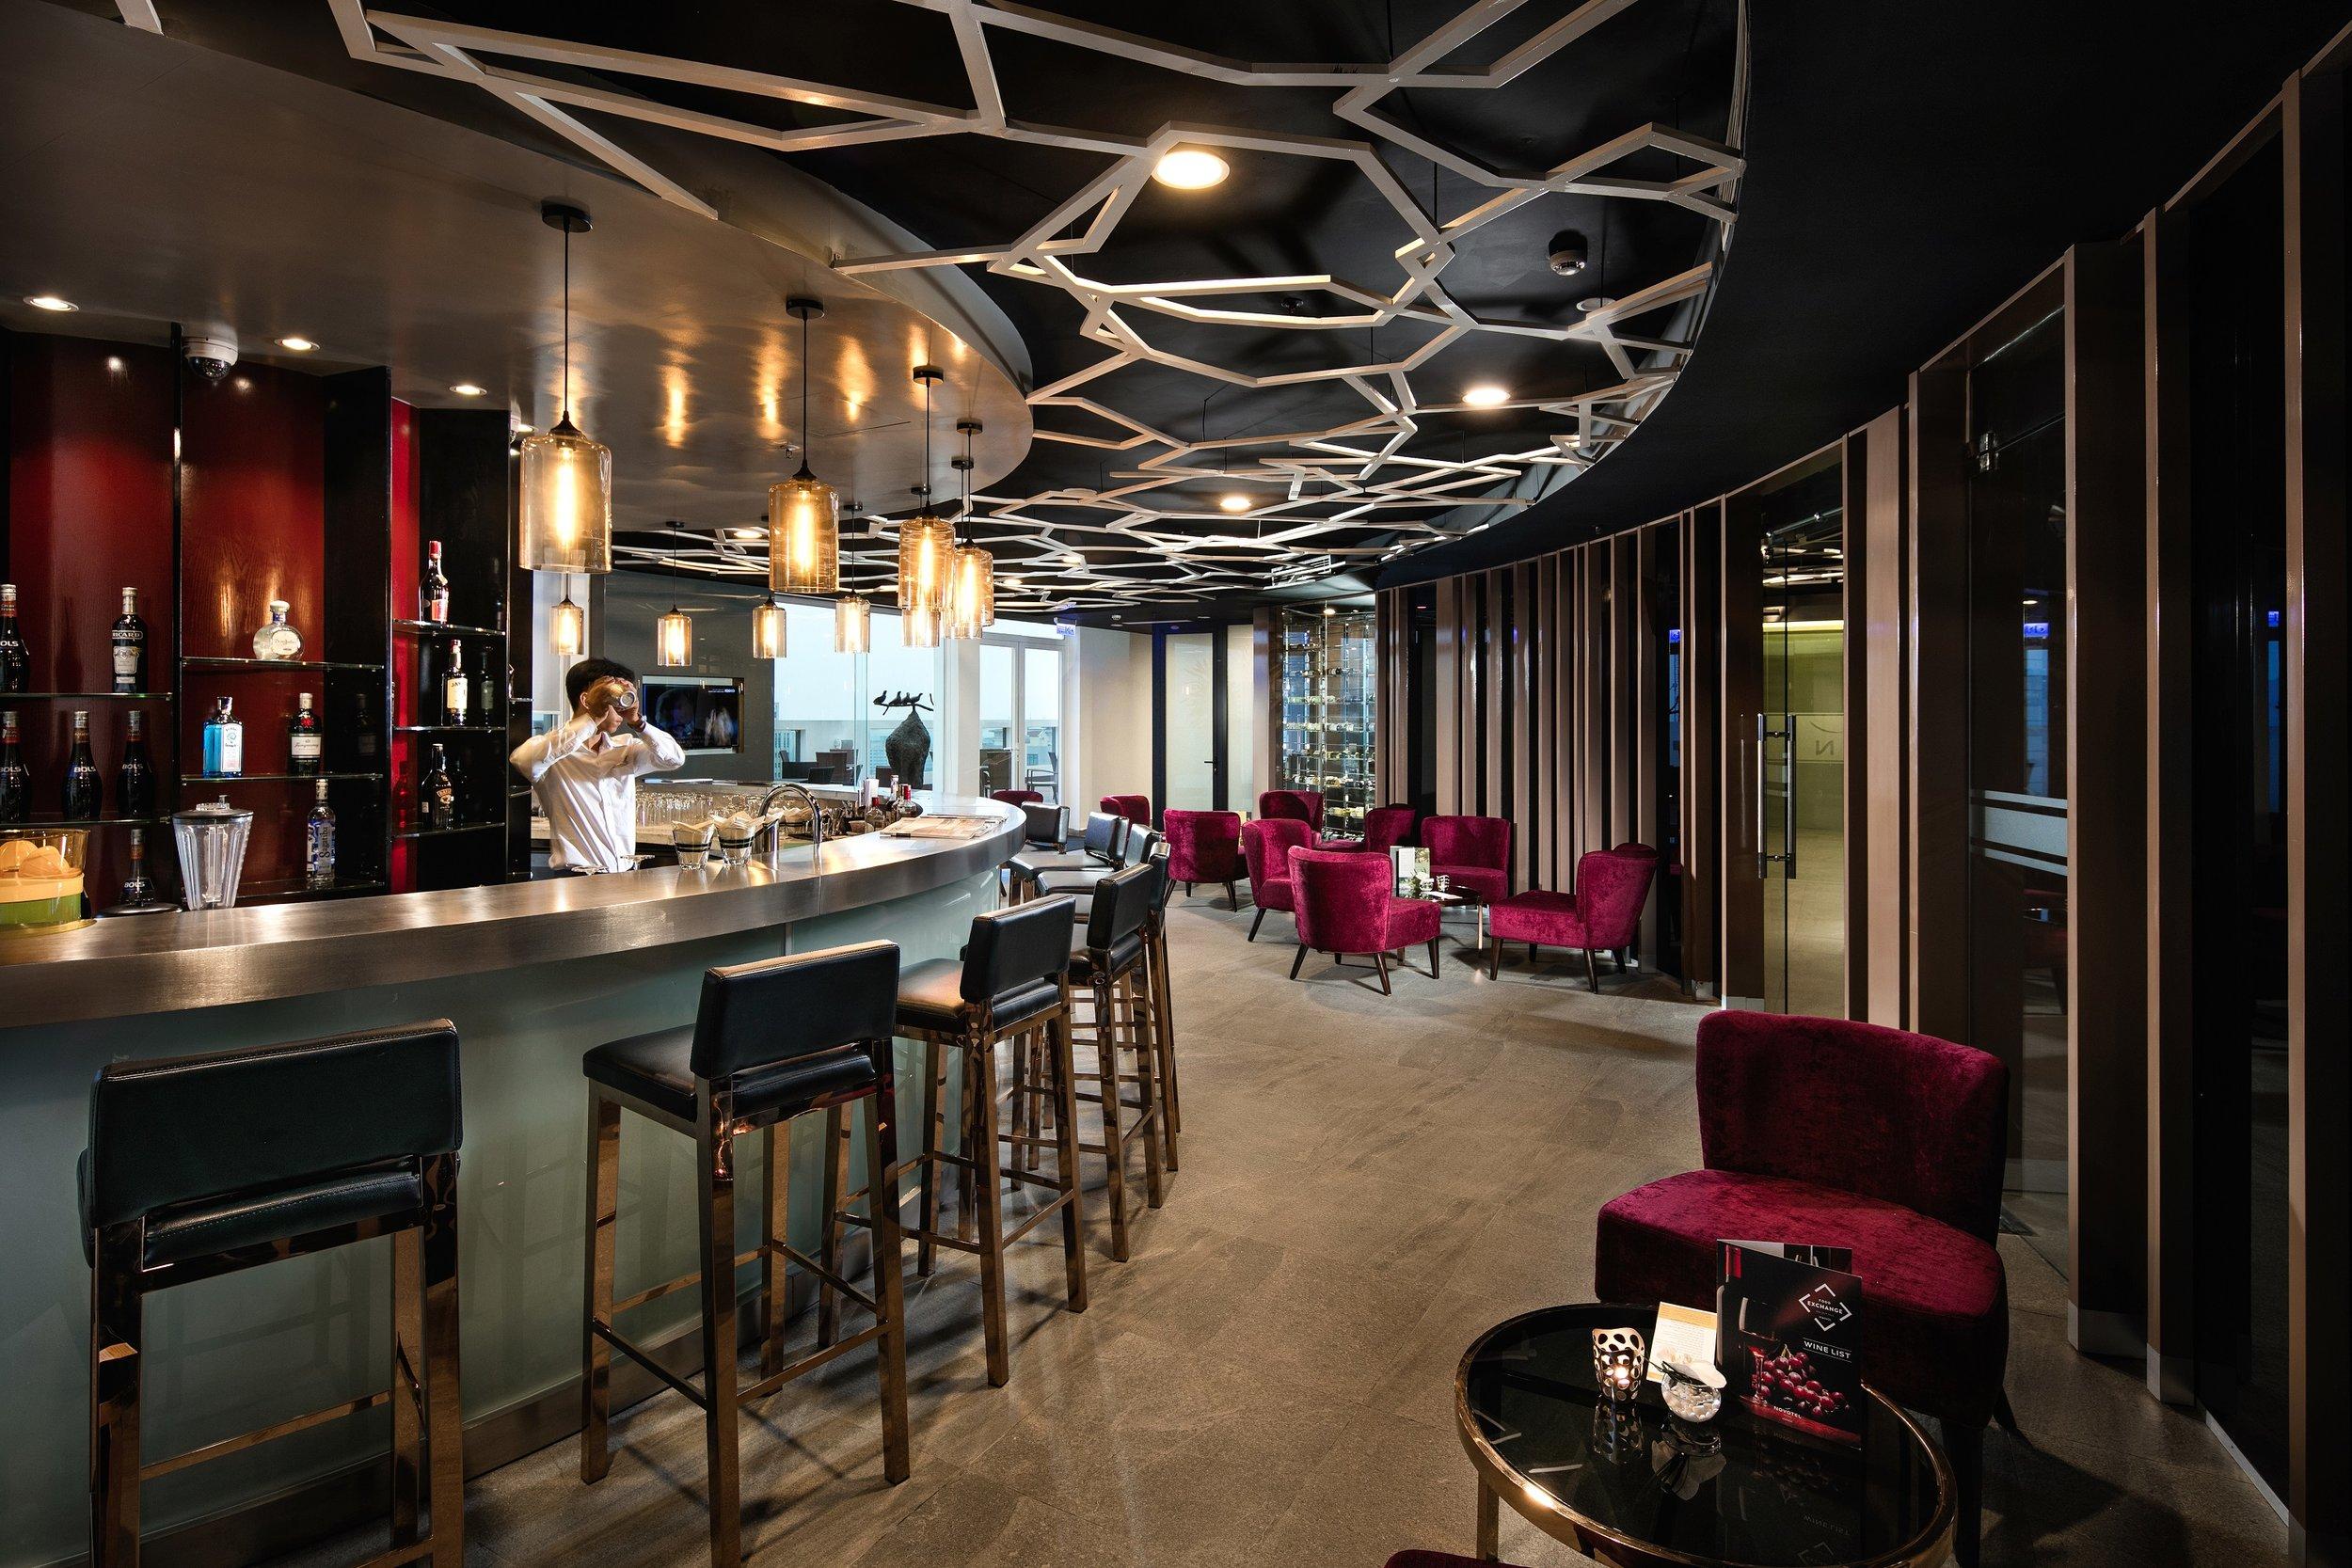 Bar | Photo Credit: Novotel Suites Hanoi